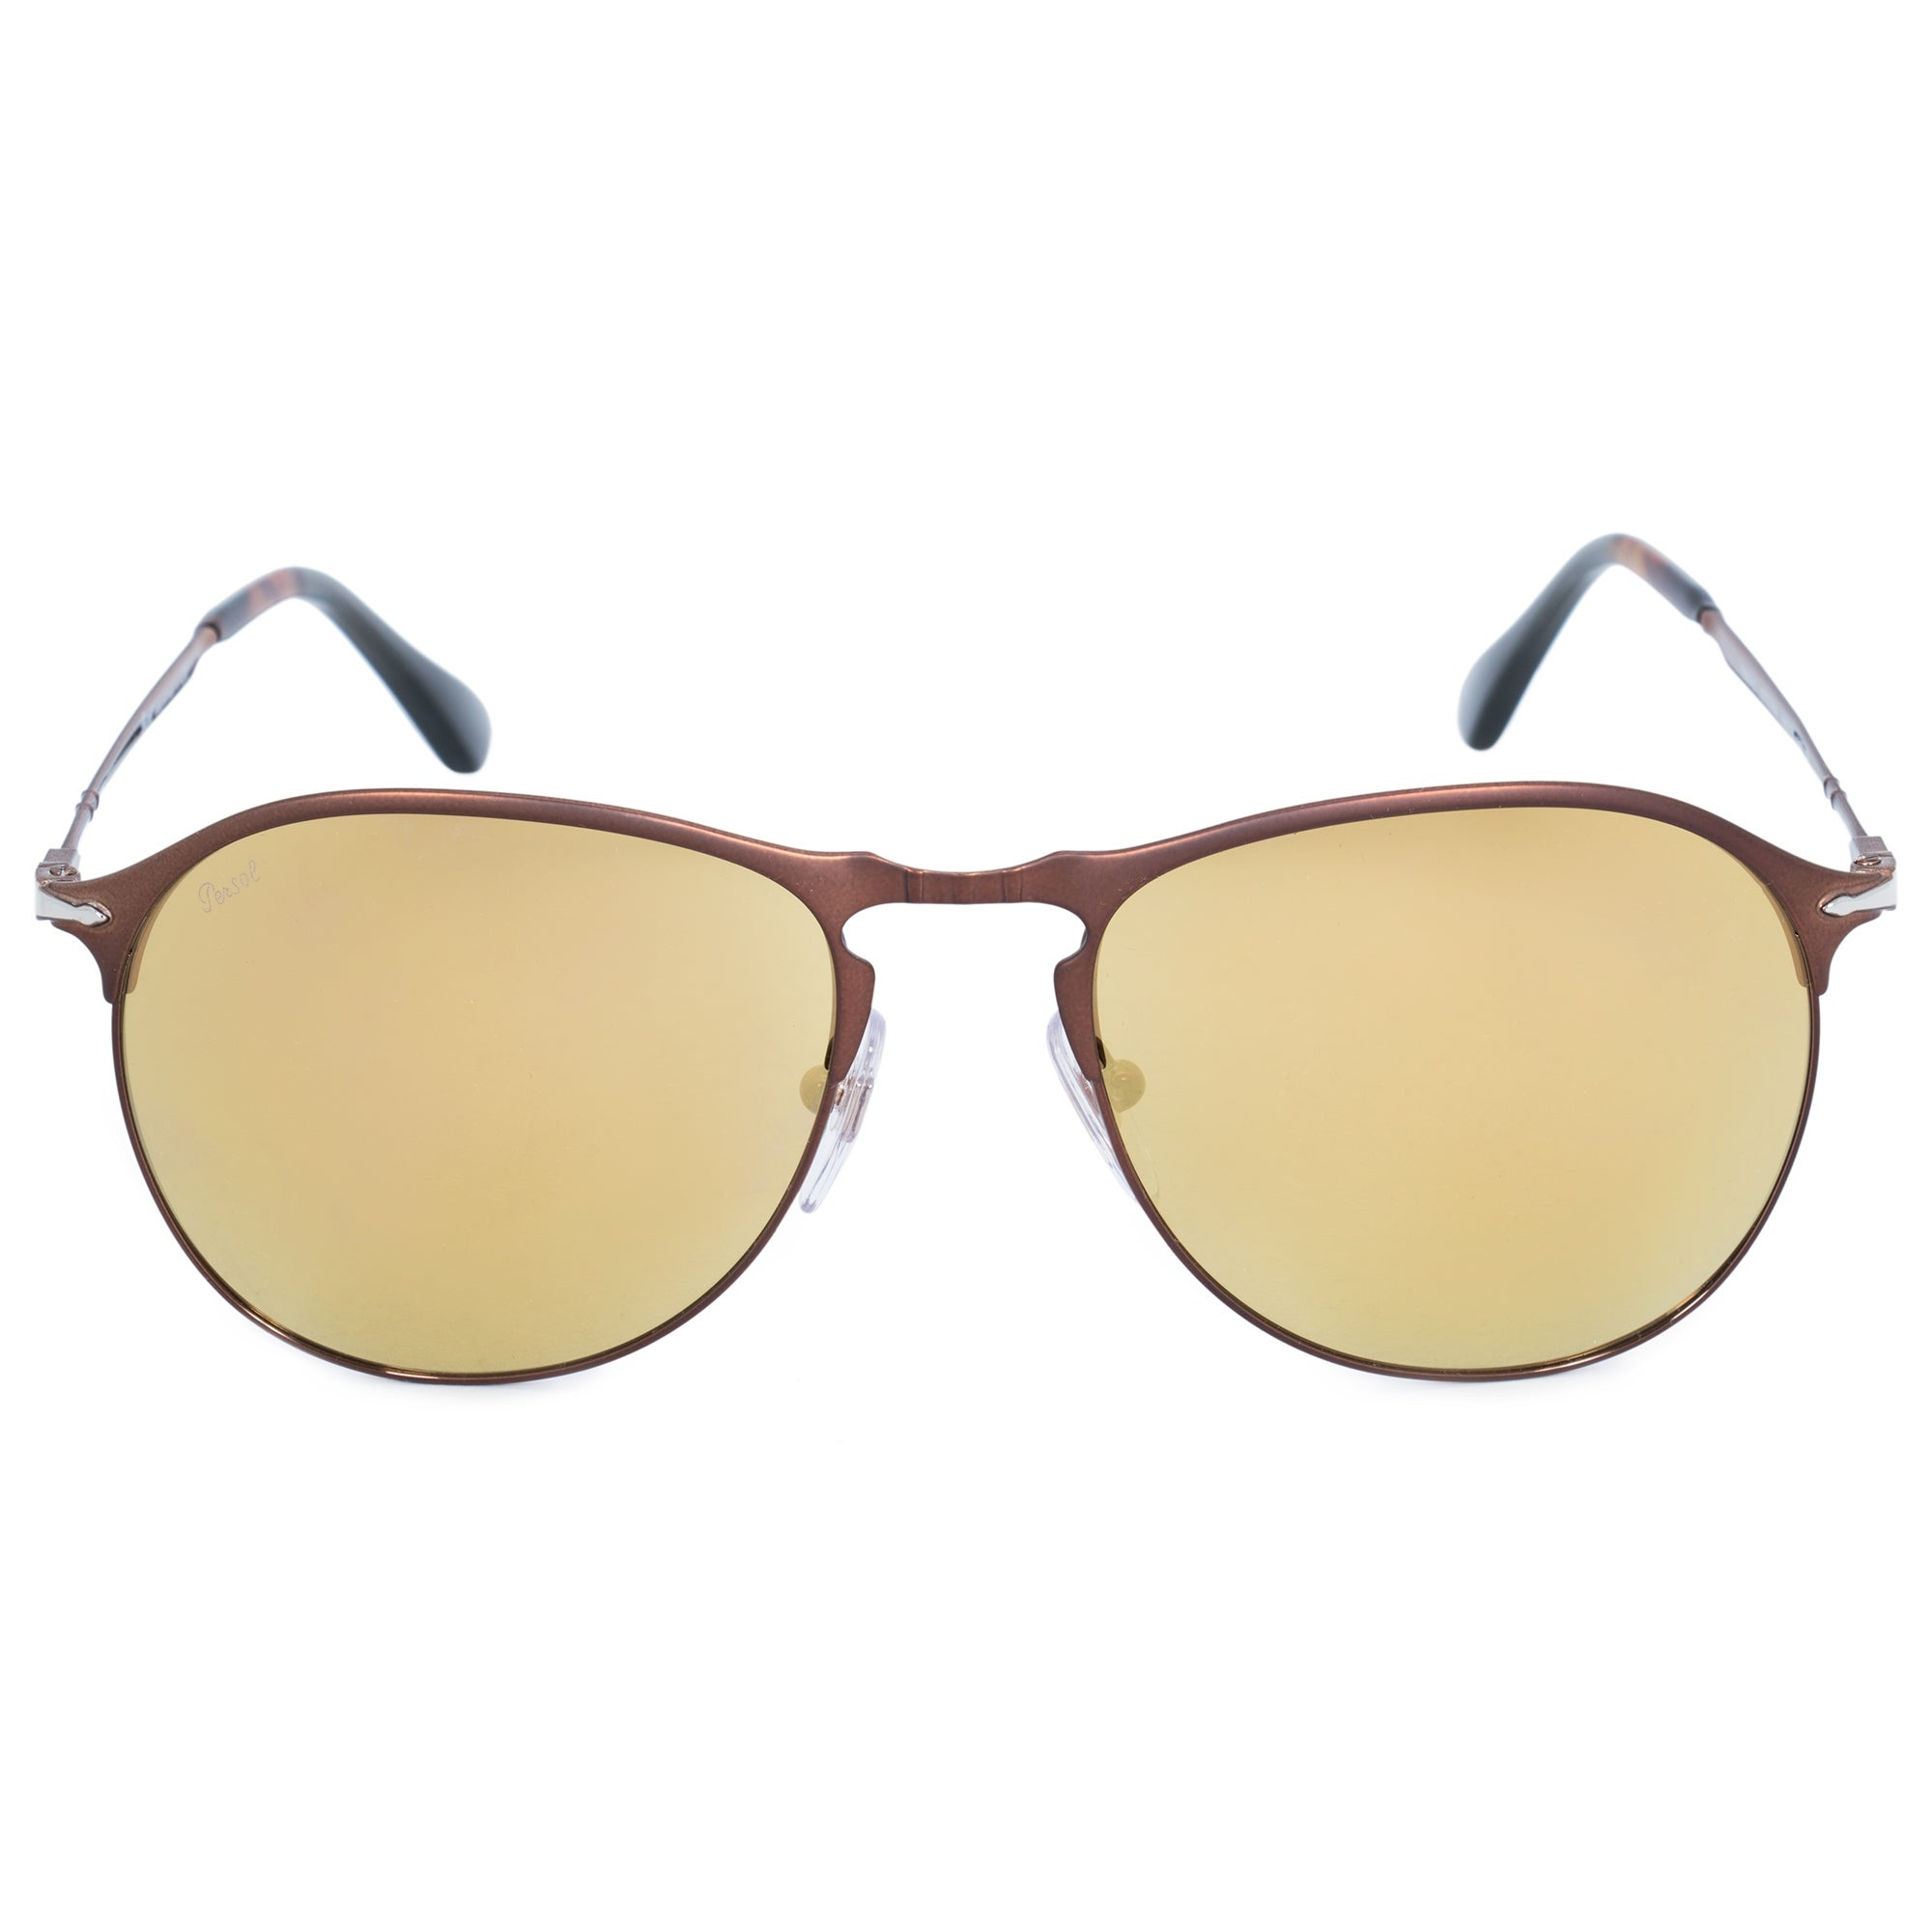 57ca6a1503 Persol Women s Sunglasses